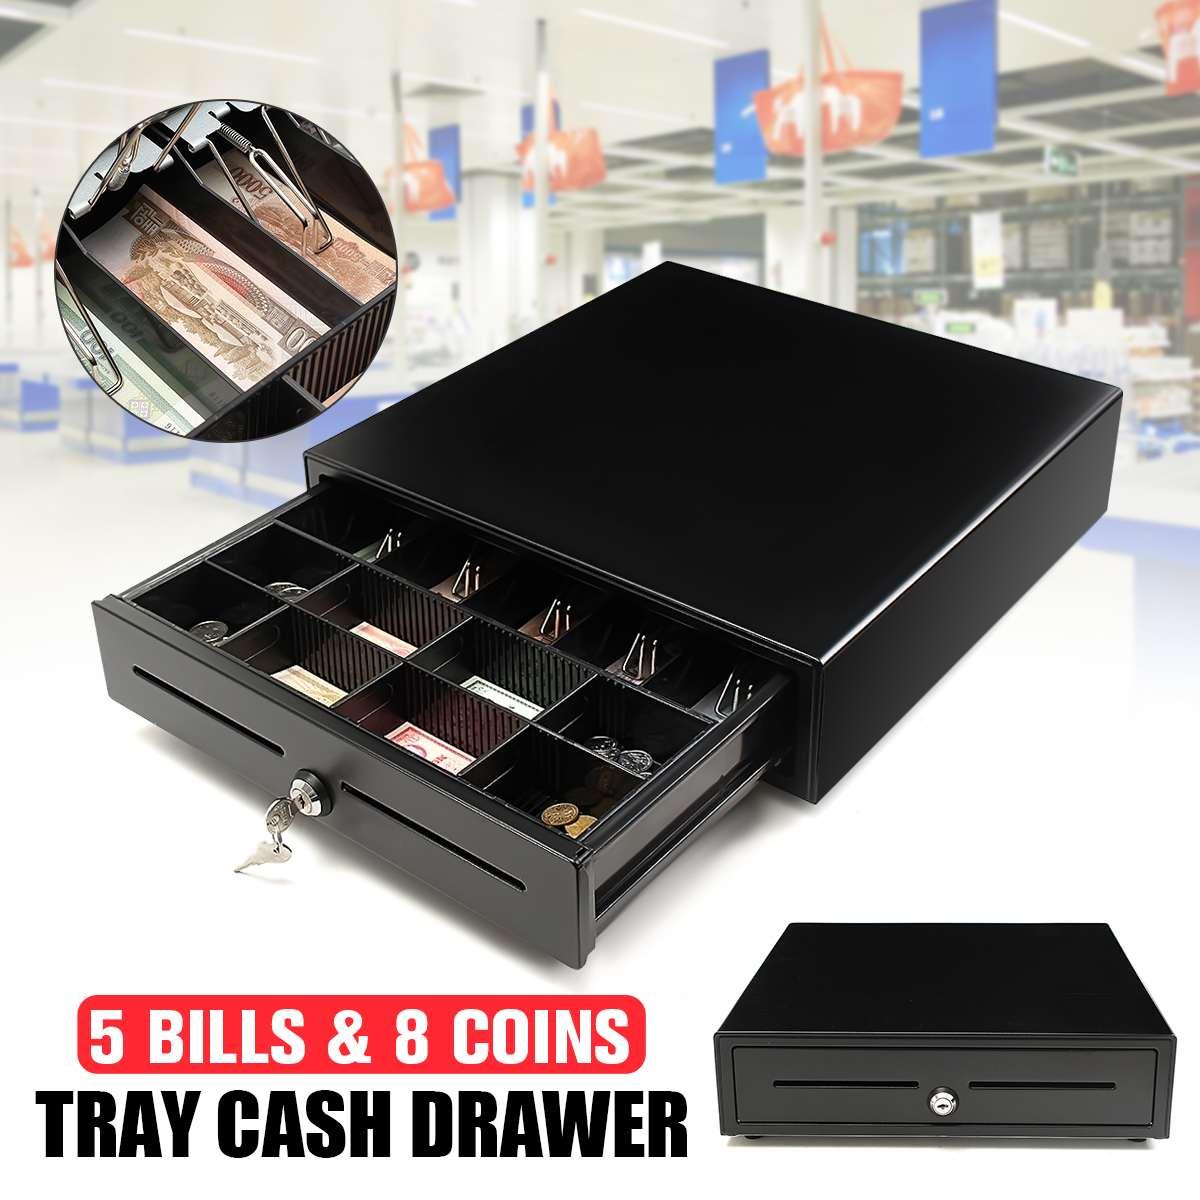 Heavy Duty POS Cash Drawer Register 5 Bills 5 Coins Removable Cash Tray Till Box